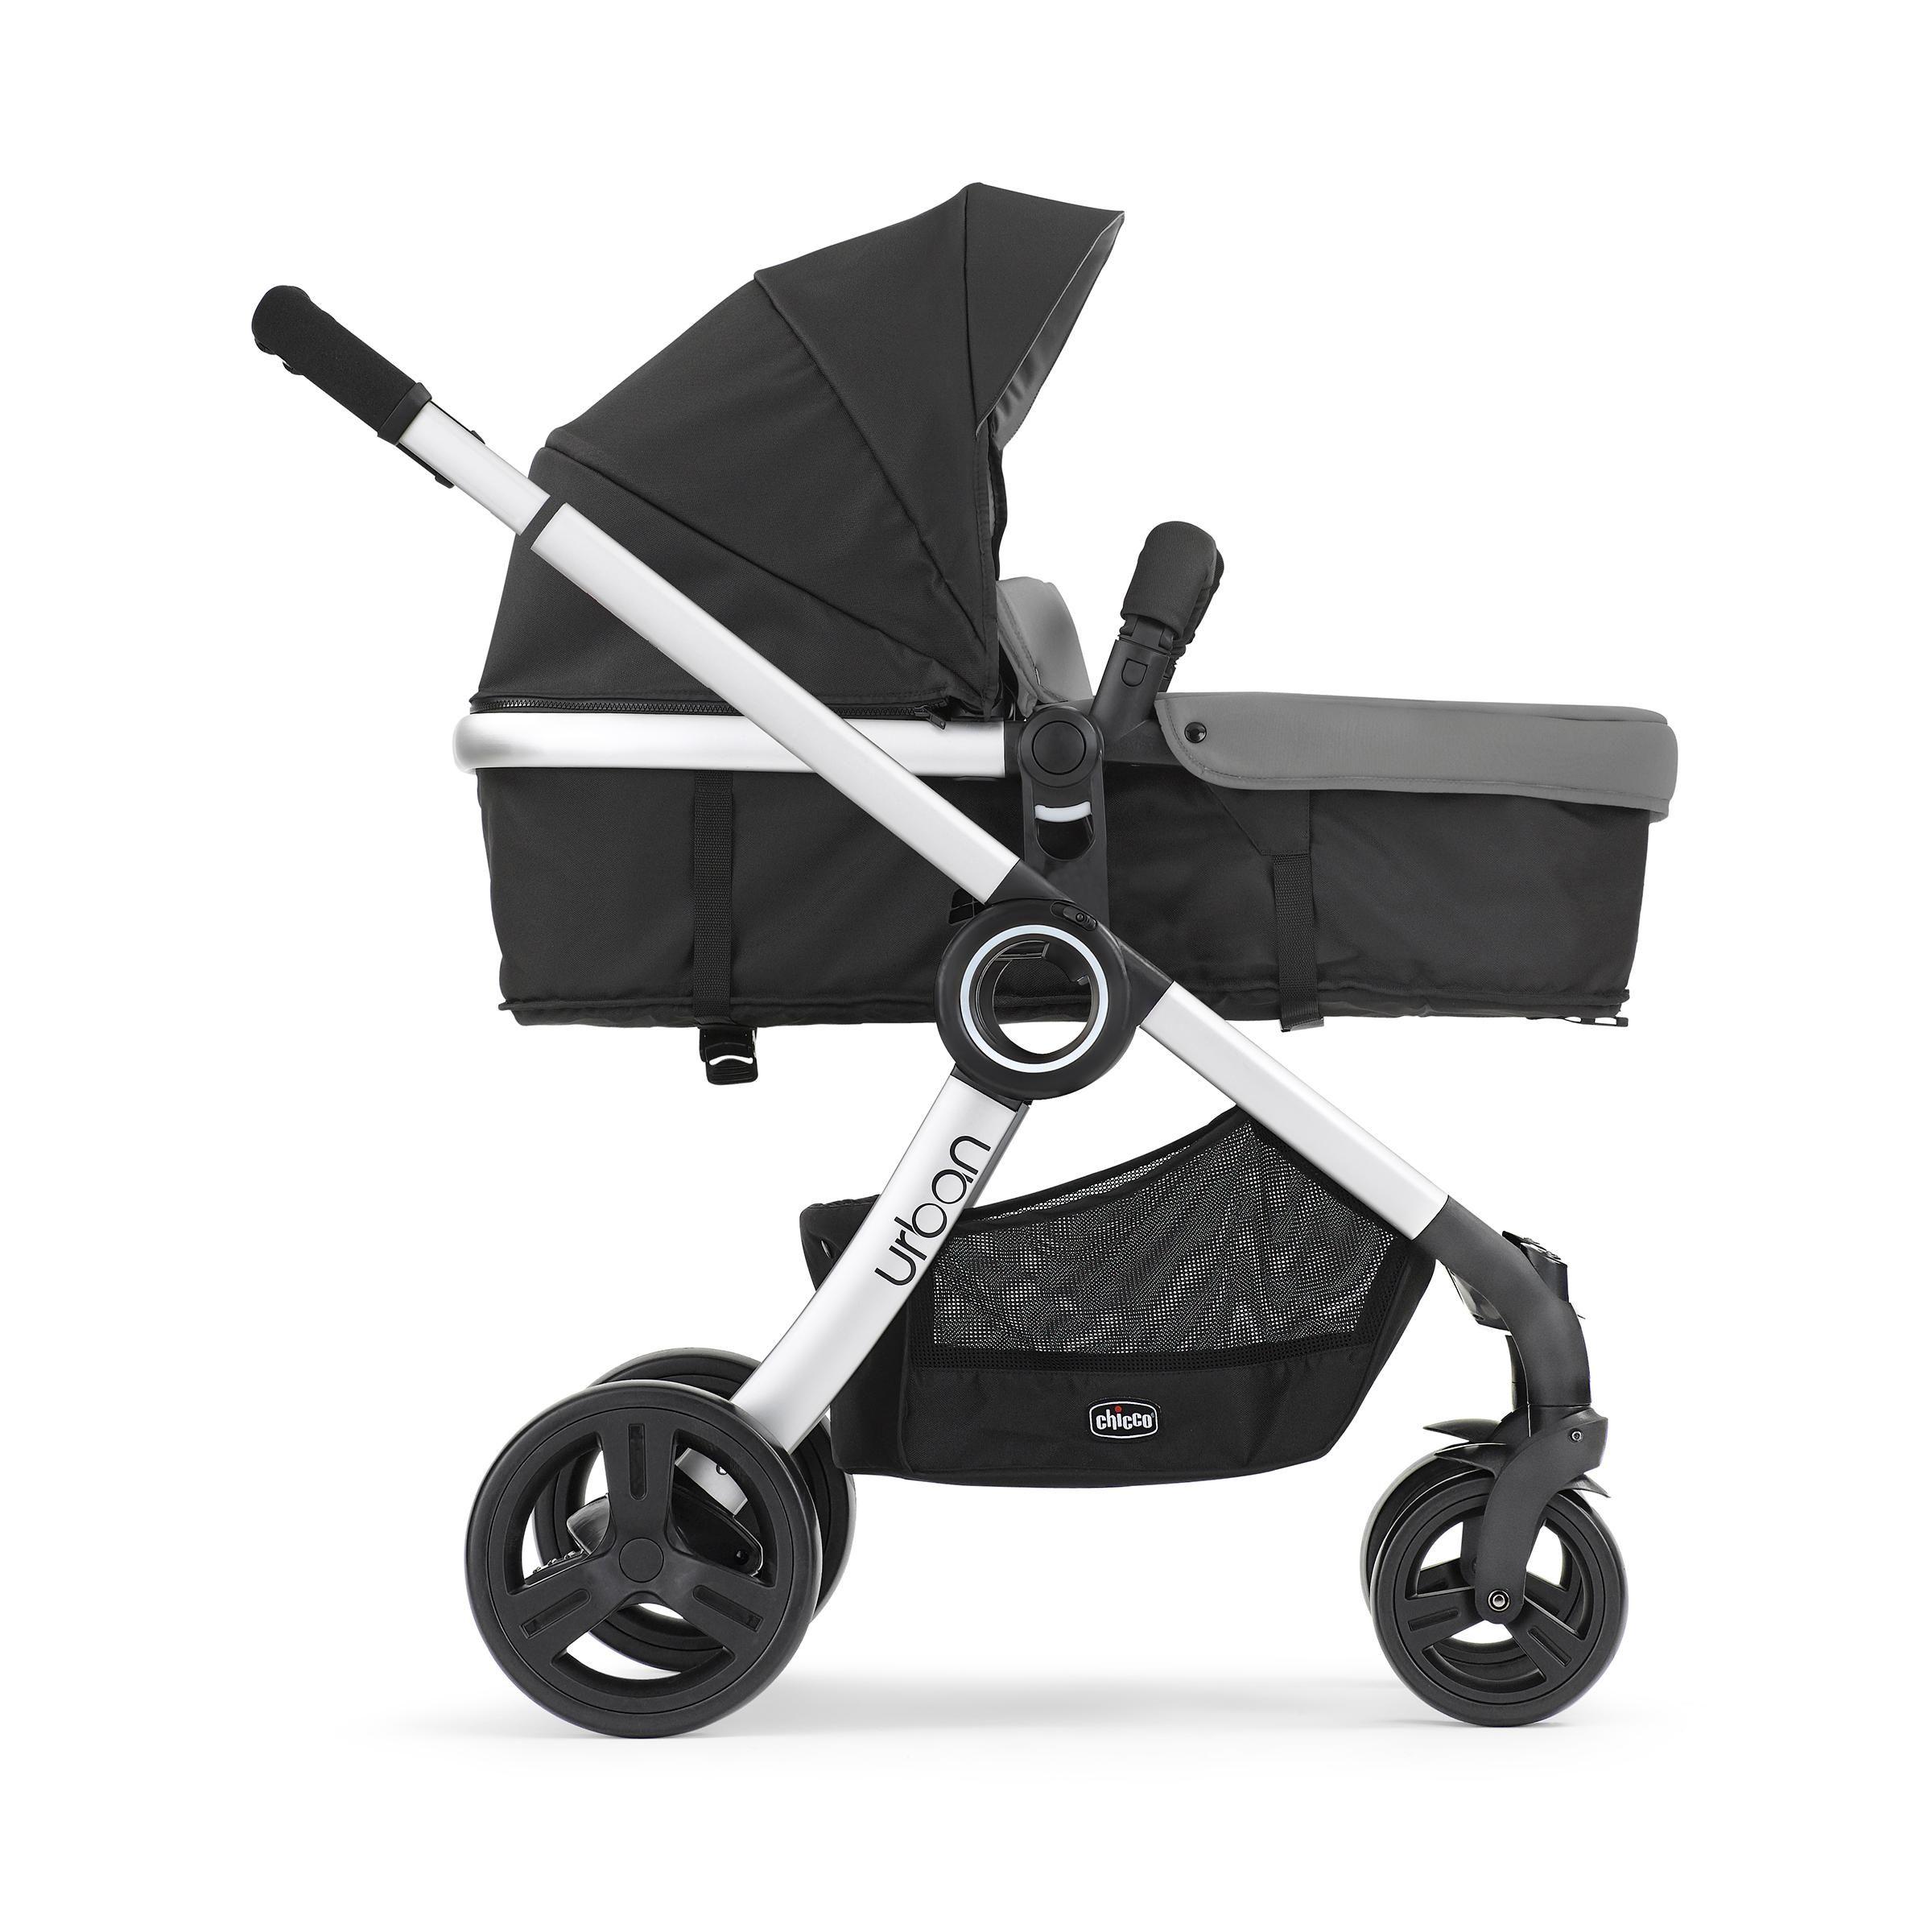 Chicco Urban Stroller, Coal Modular stroller, Urban